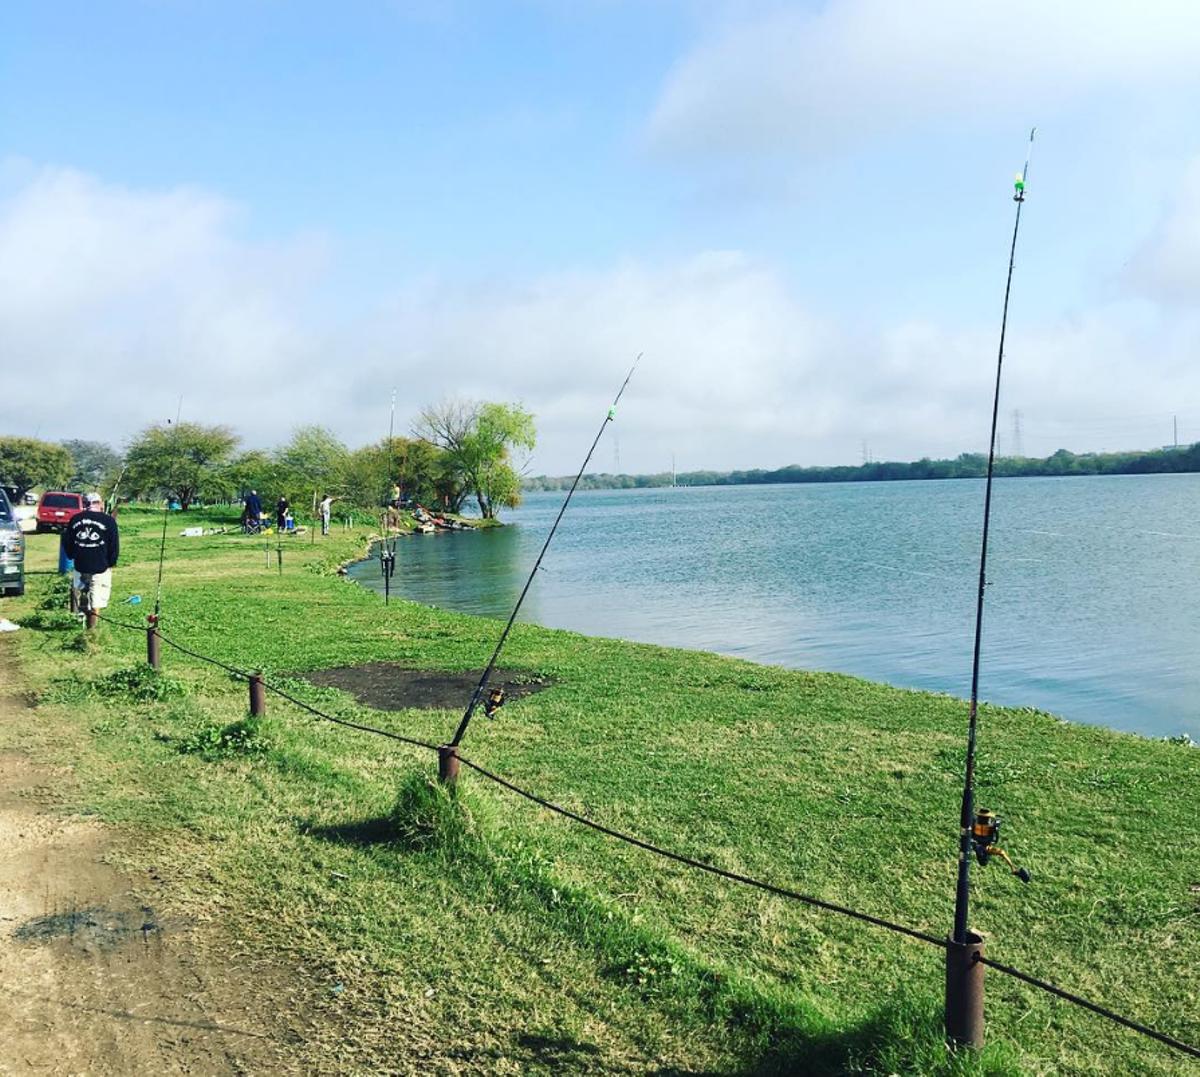 15 Places to Go Fishing in San Antonio | San Antonio